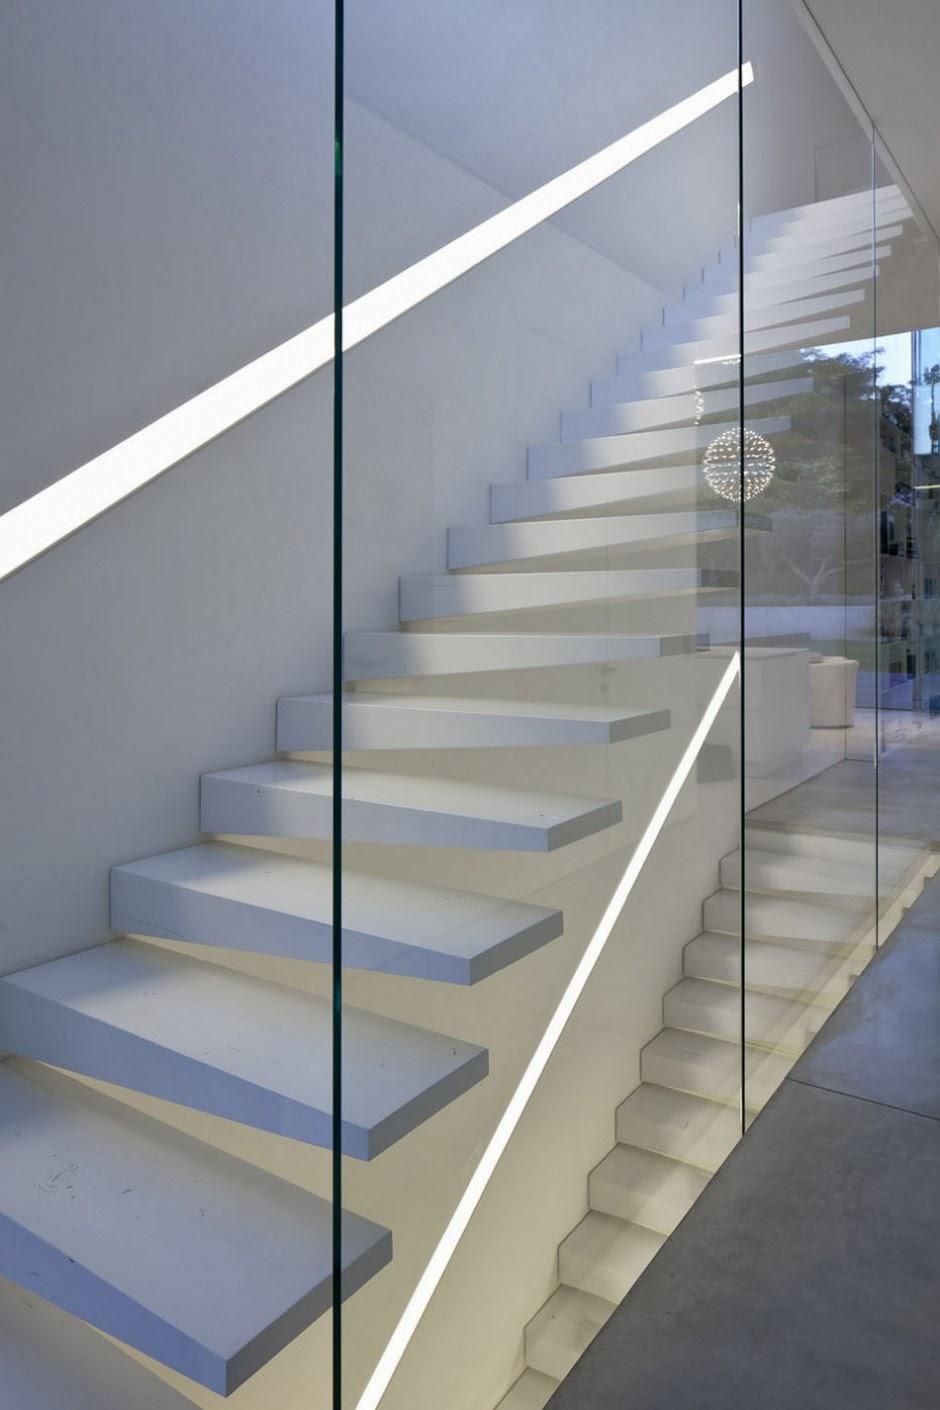 Diseno Escaleras Interiores Blancas Arquitexs - Diseo-escaleras-interiores